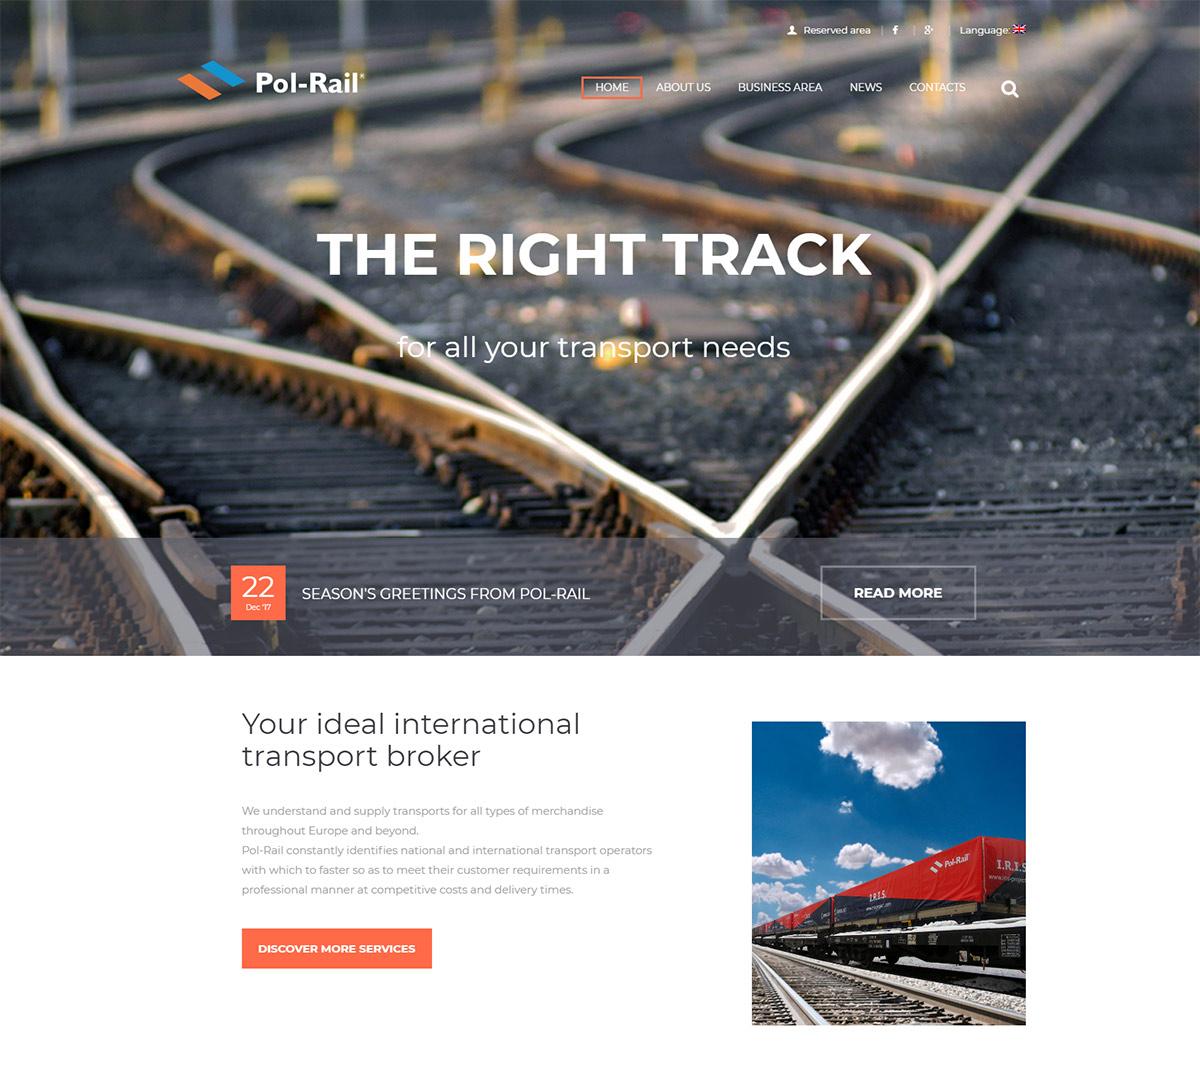 Sito internet Pol-Rail